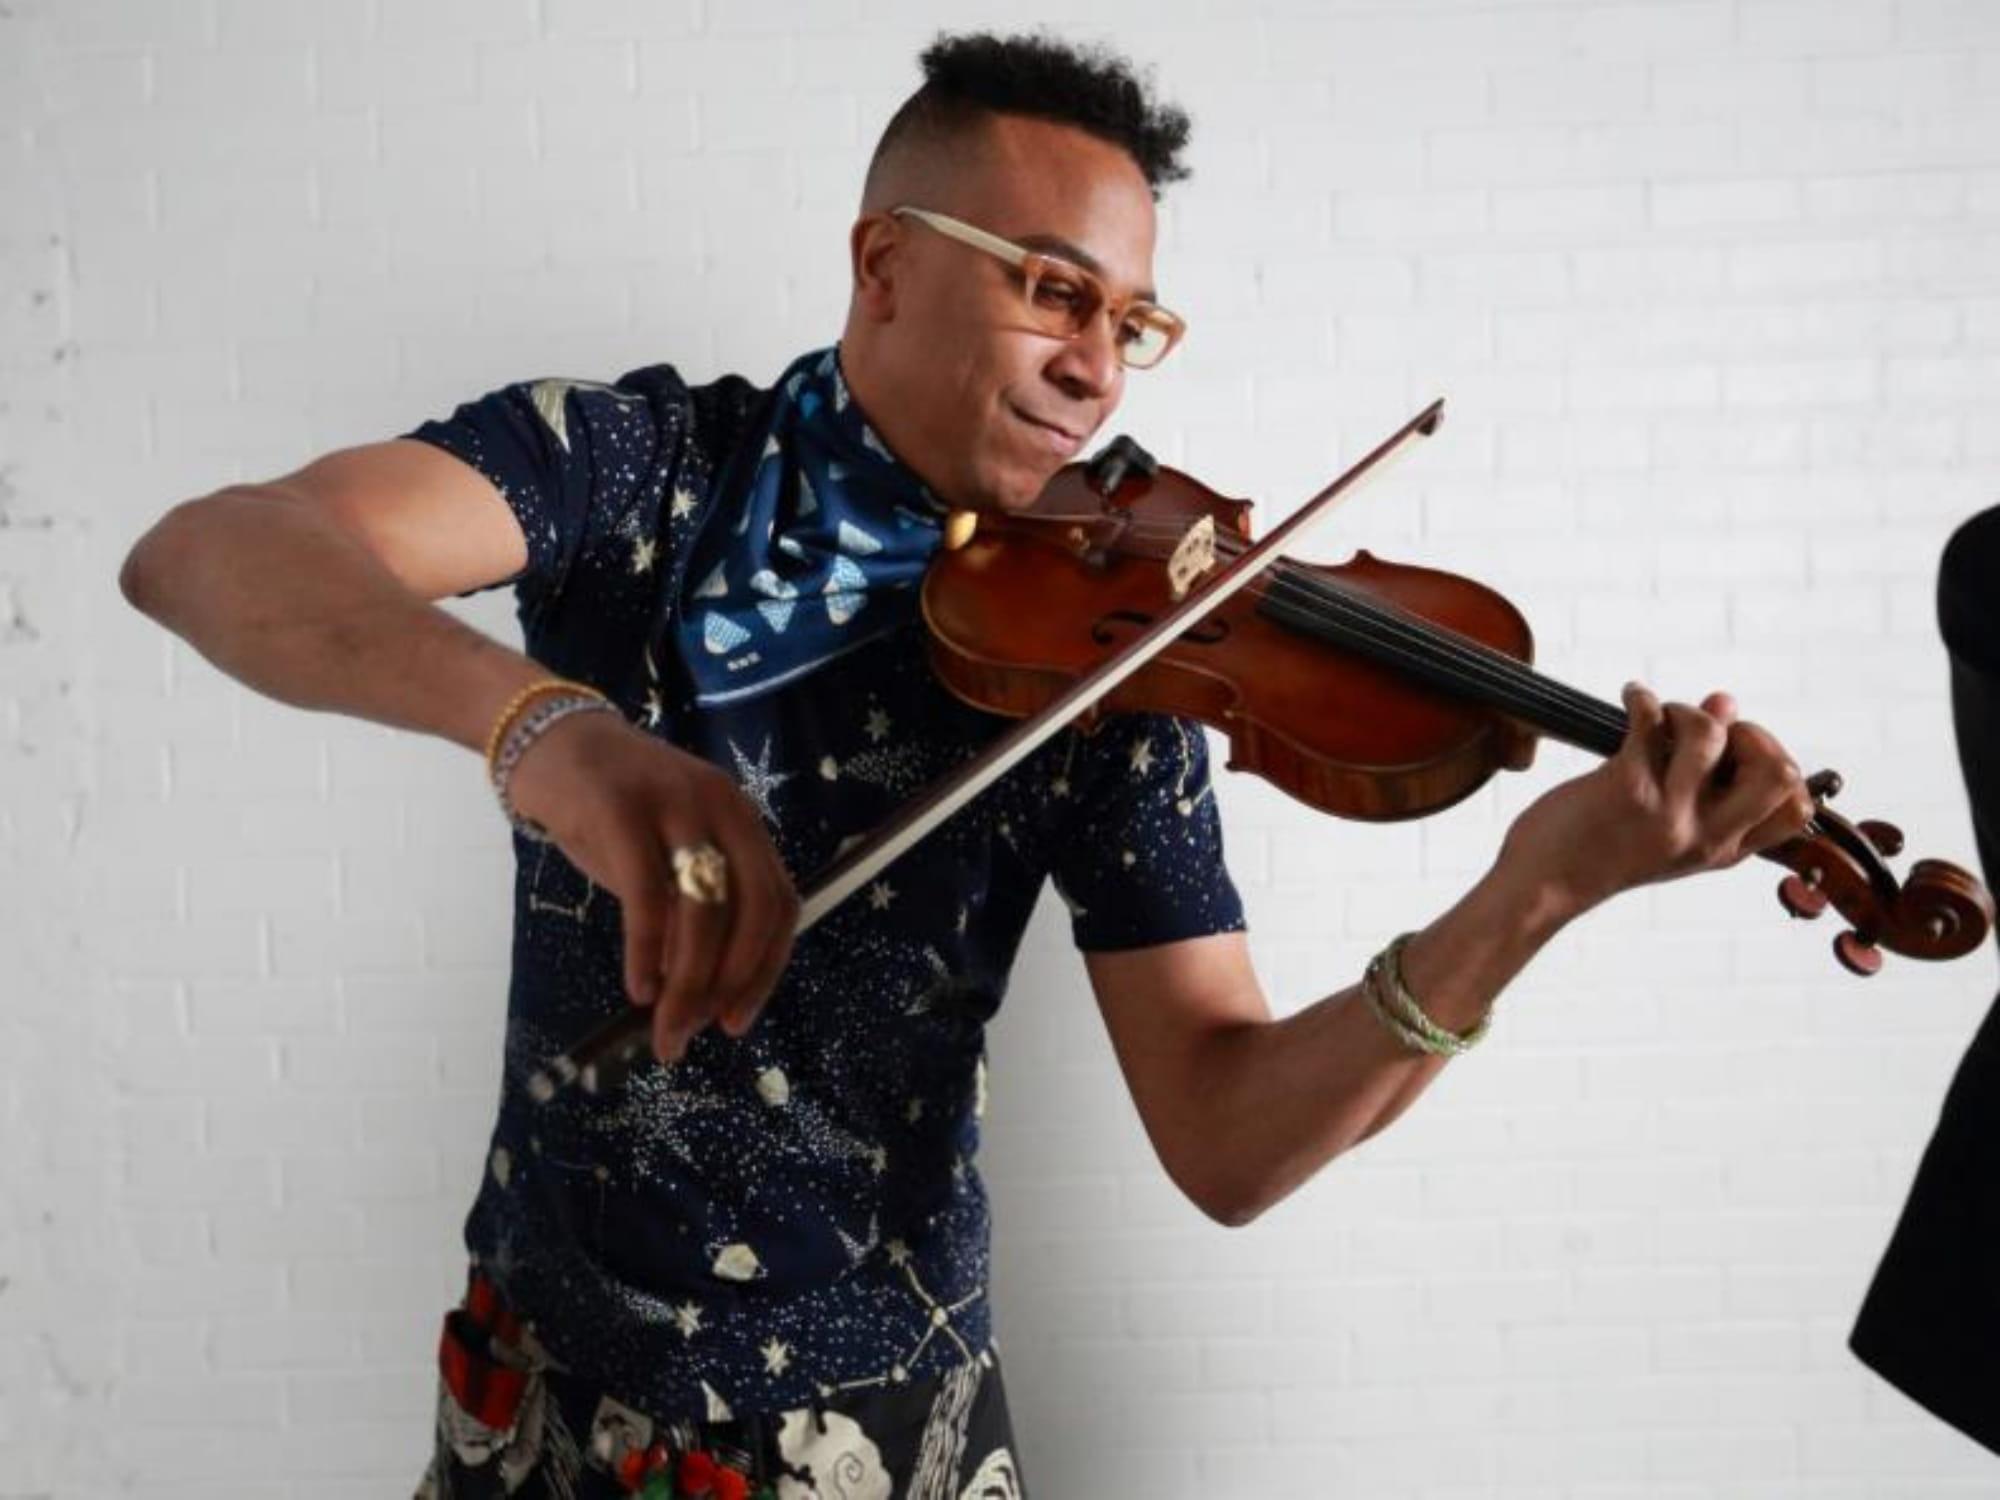 Ma*jid: The Rite Of Strings Feat. Dyme-a-duzin